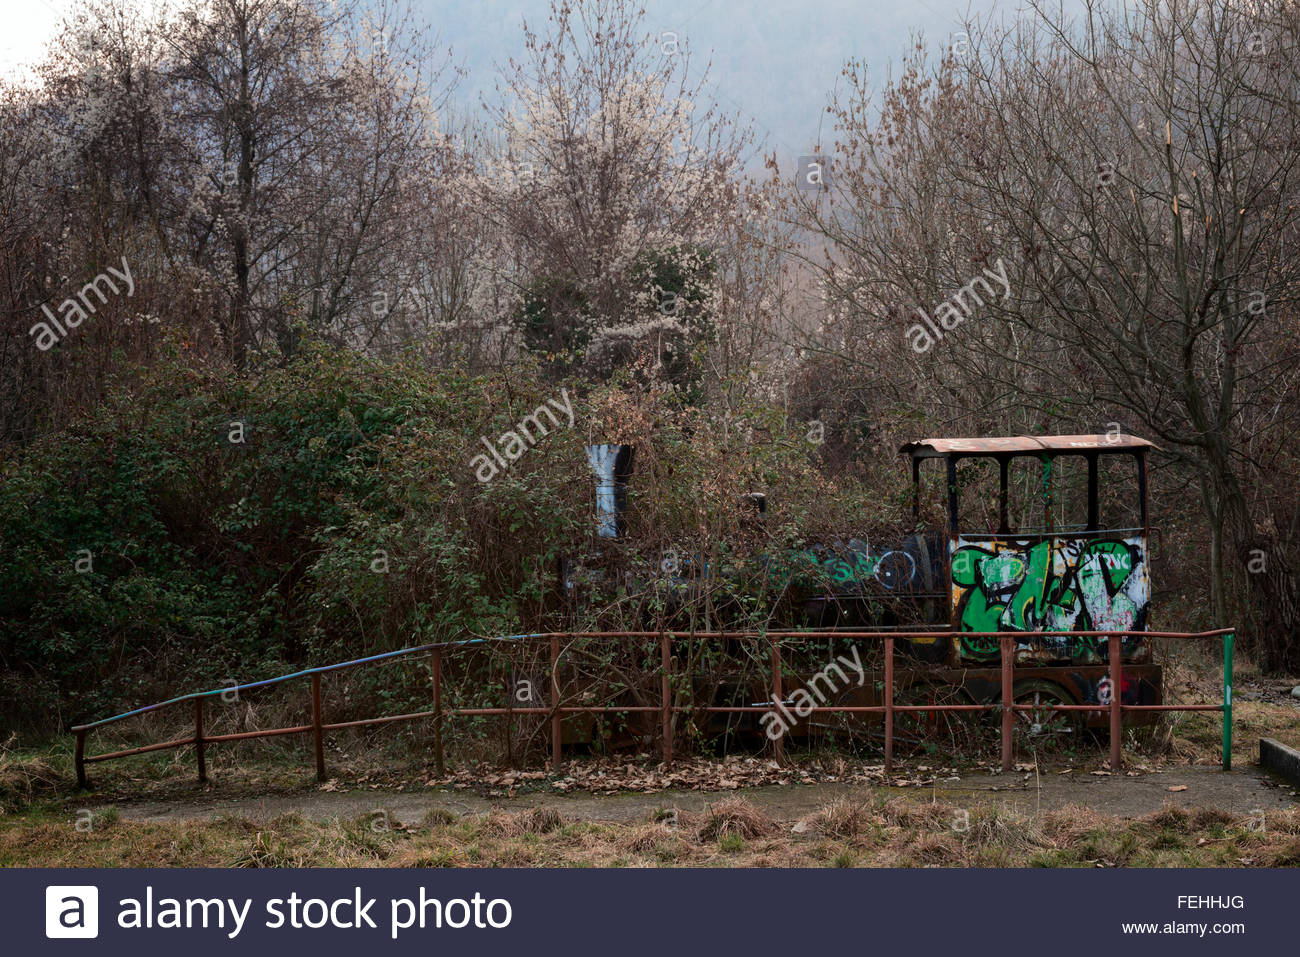 Abandoned amusement park train - Stock Image